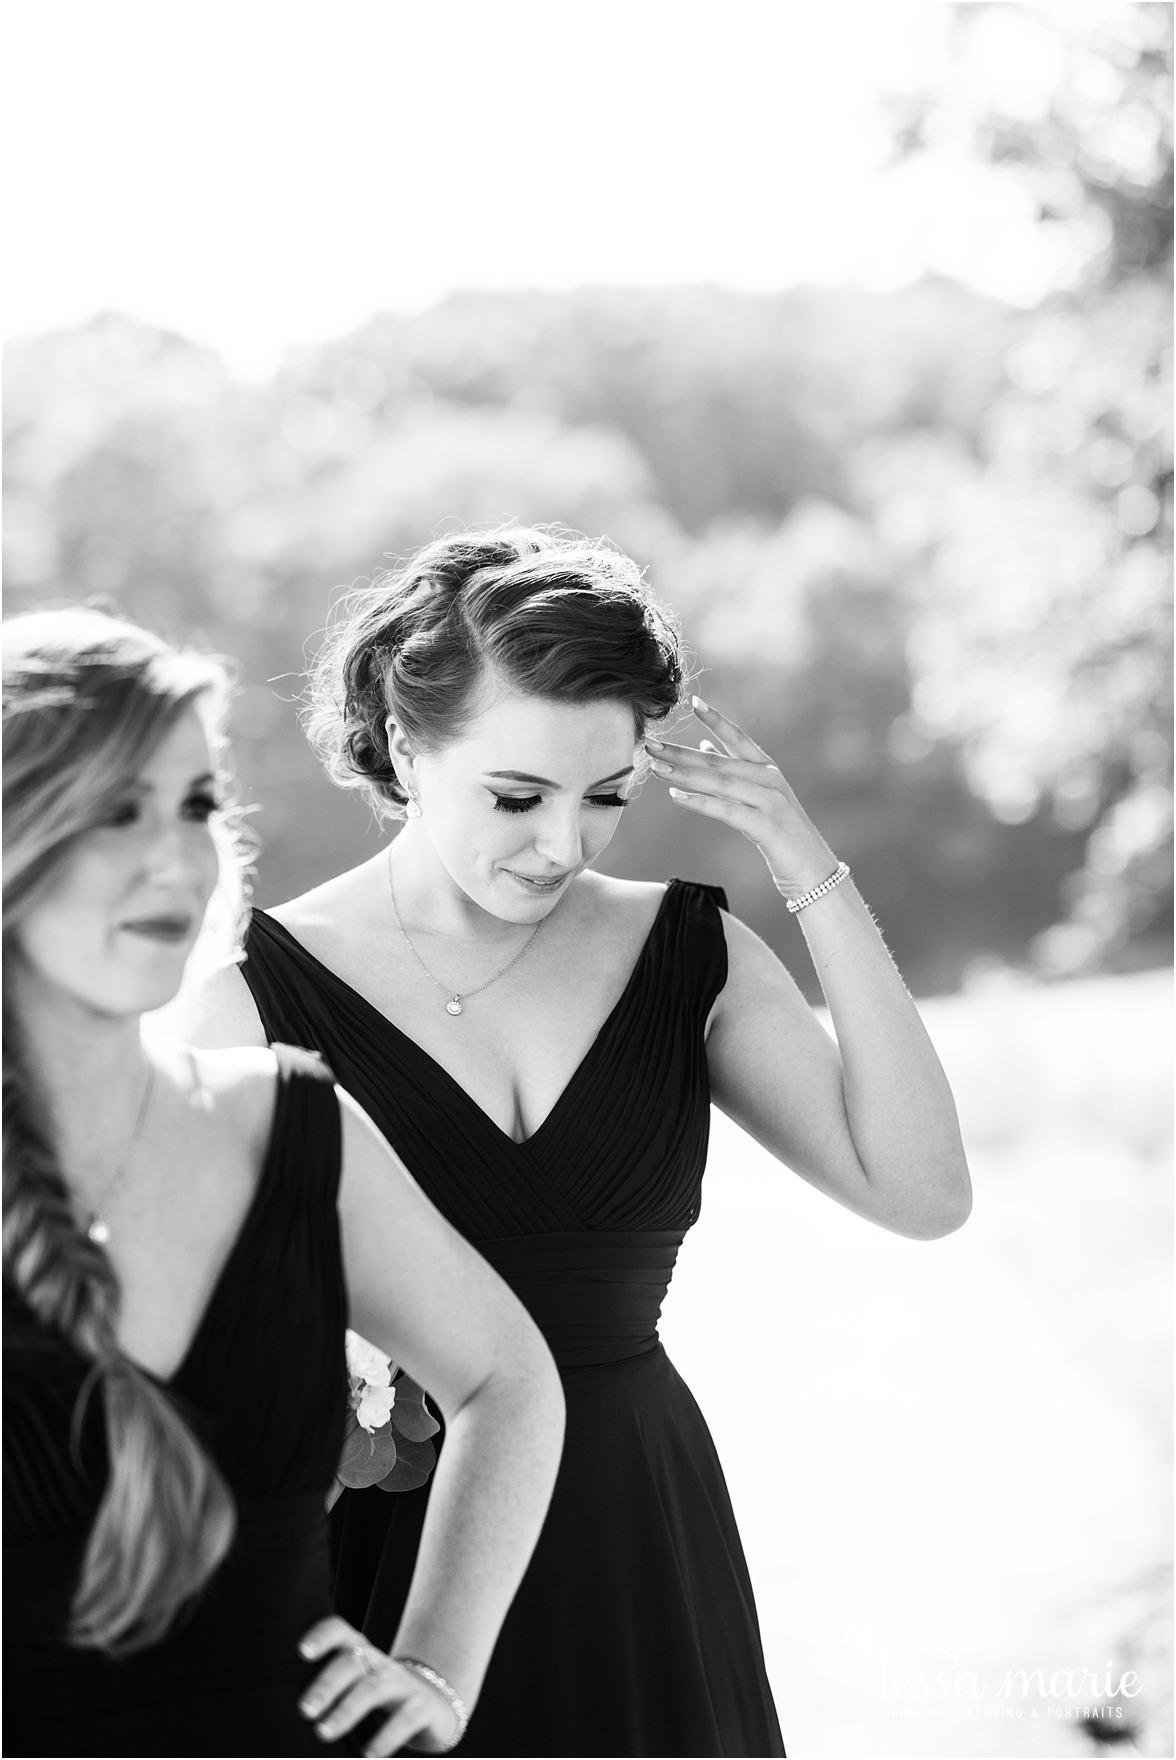 lake_lanier_wedding_summer_pictures_legacy_moments_family_candid_atlantas_best_wedding_photographer_tessa_marie_weddings_lake_lanier_bride_out_door_wedding_0229